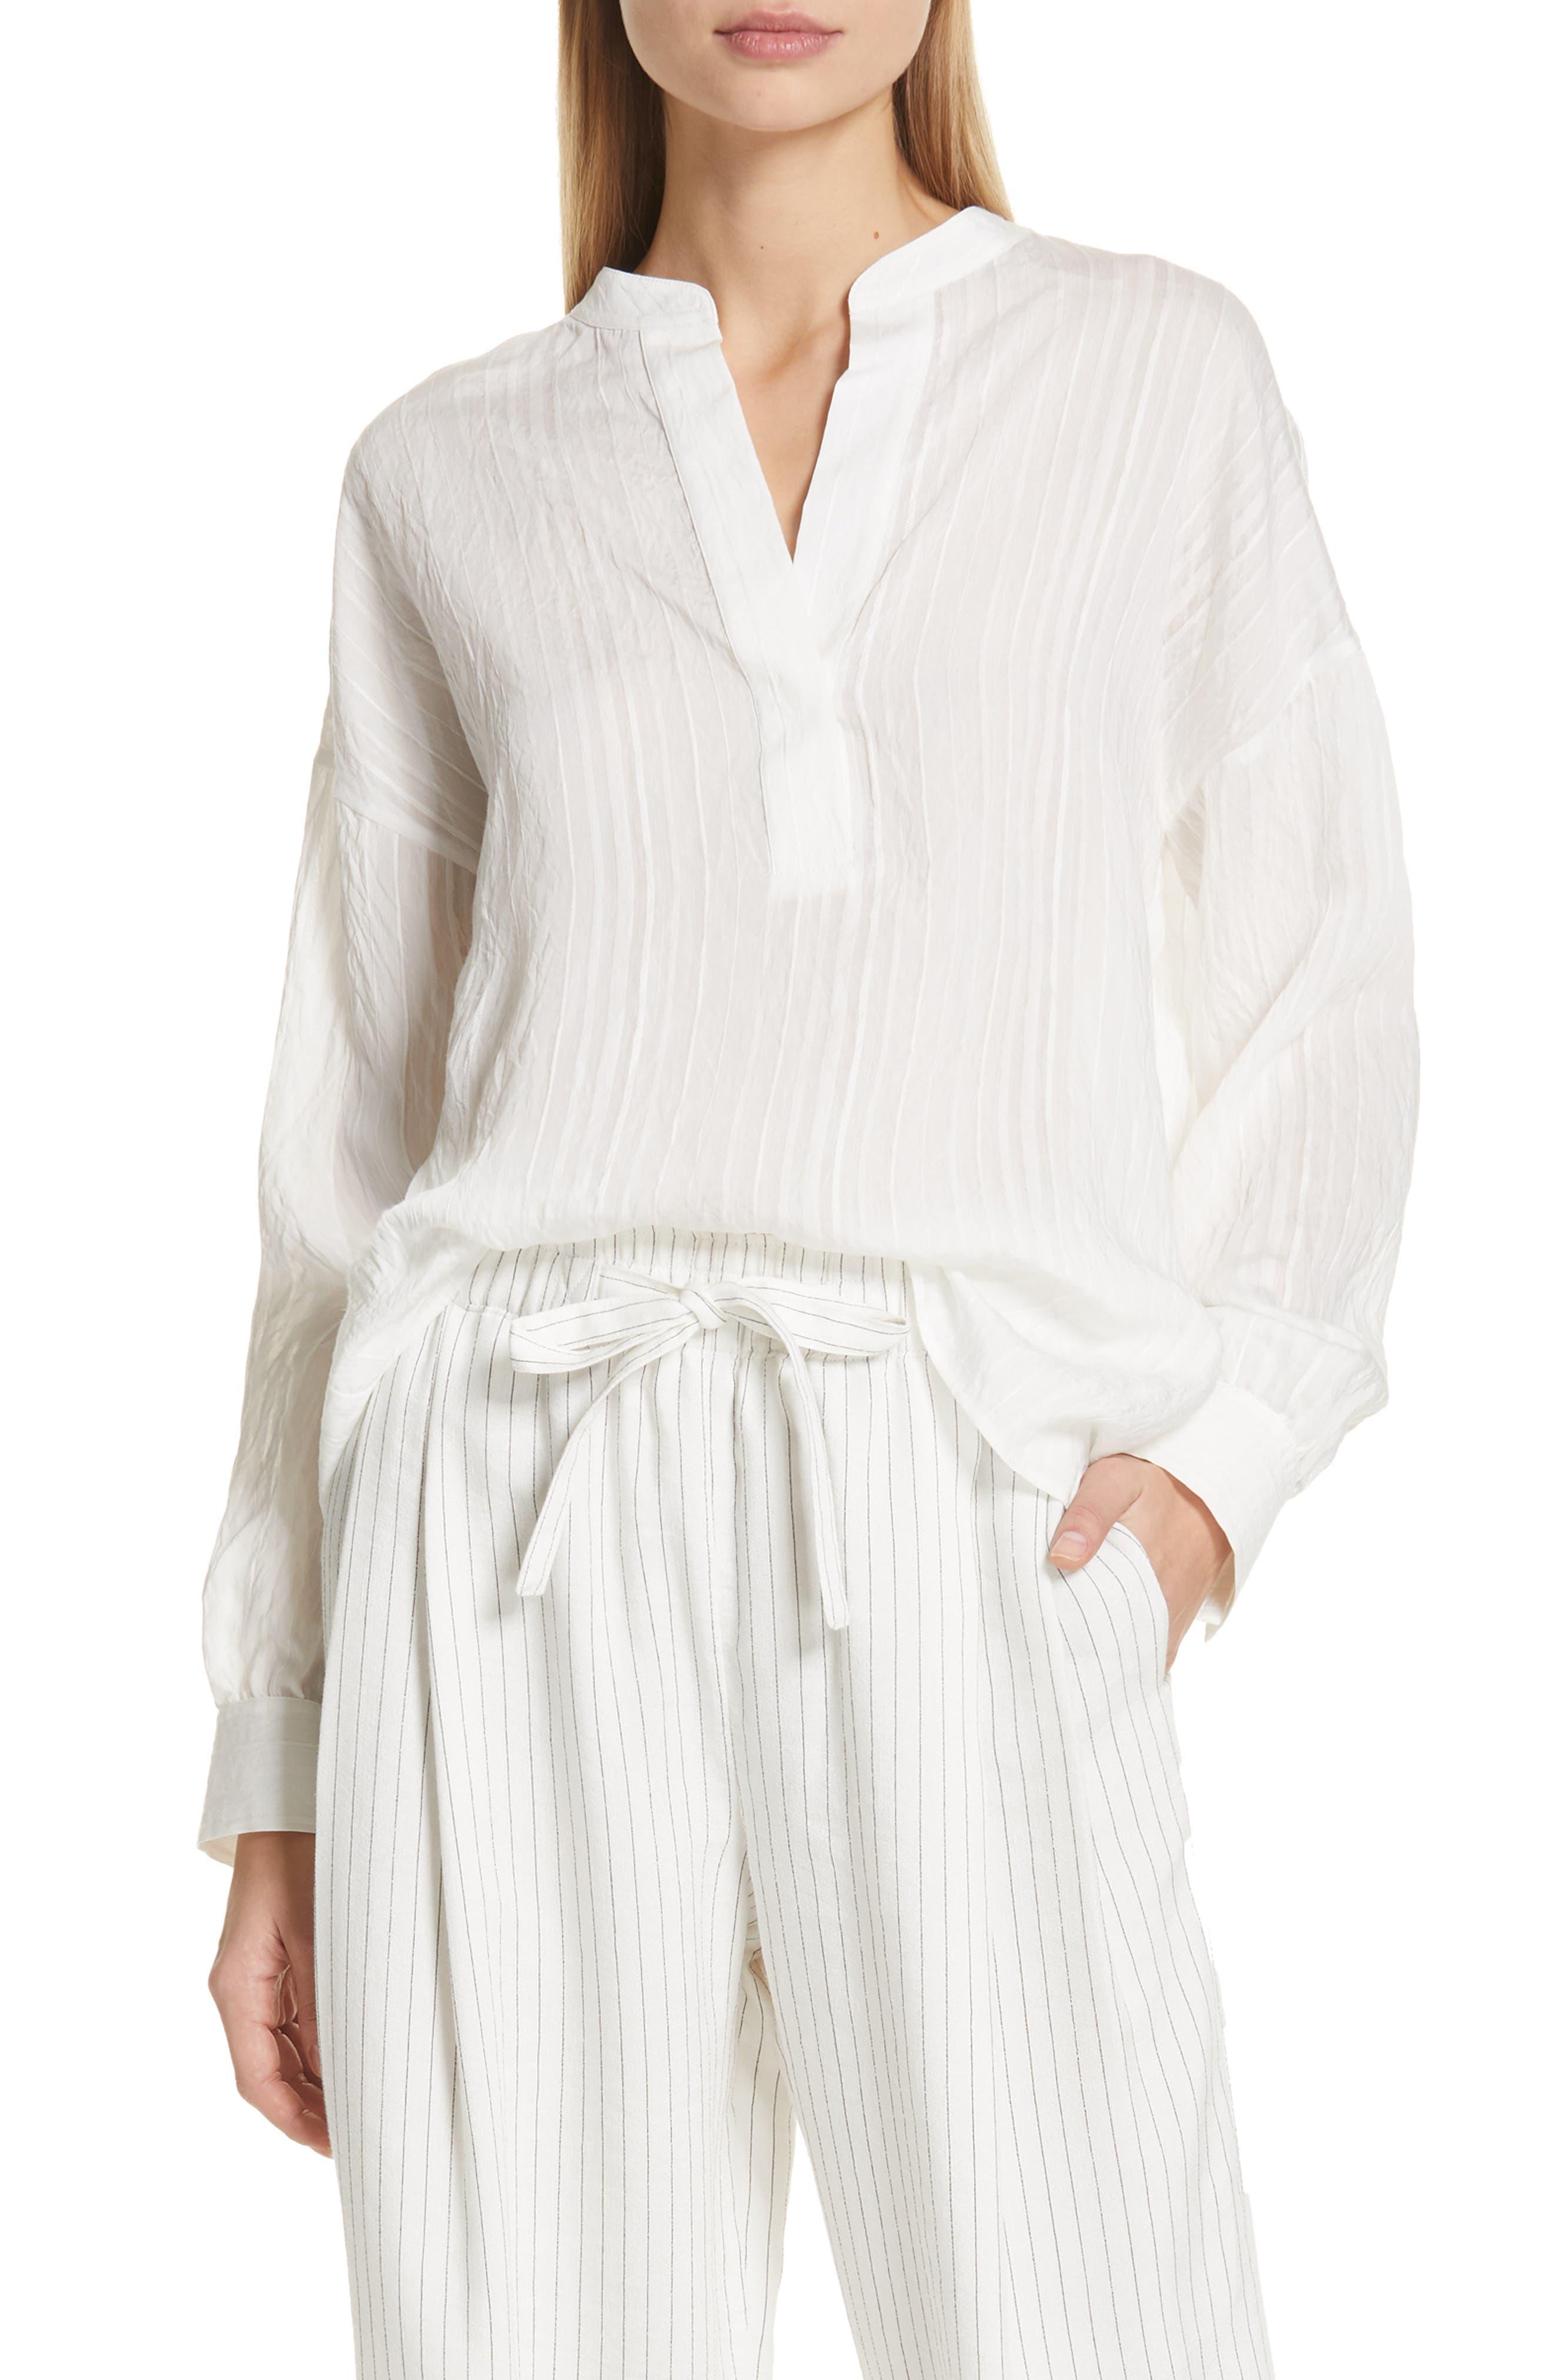 VINCE, Stripe Drop Sleeve Shirt, Main thumbnail 1, color, OPTIC WHITE